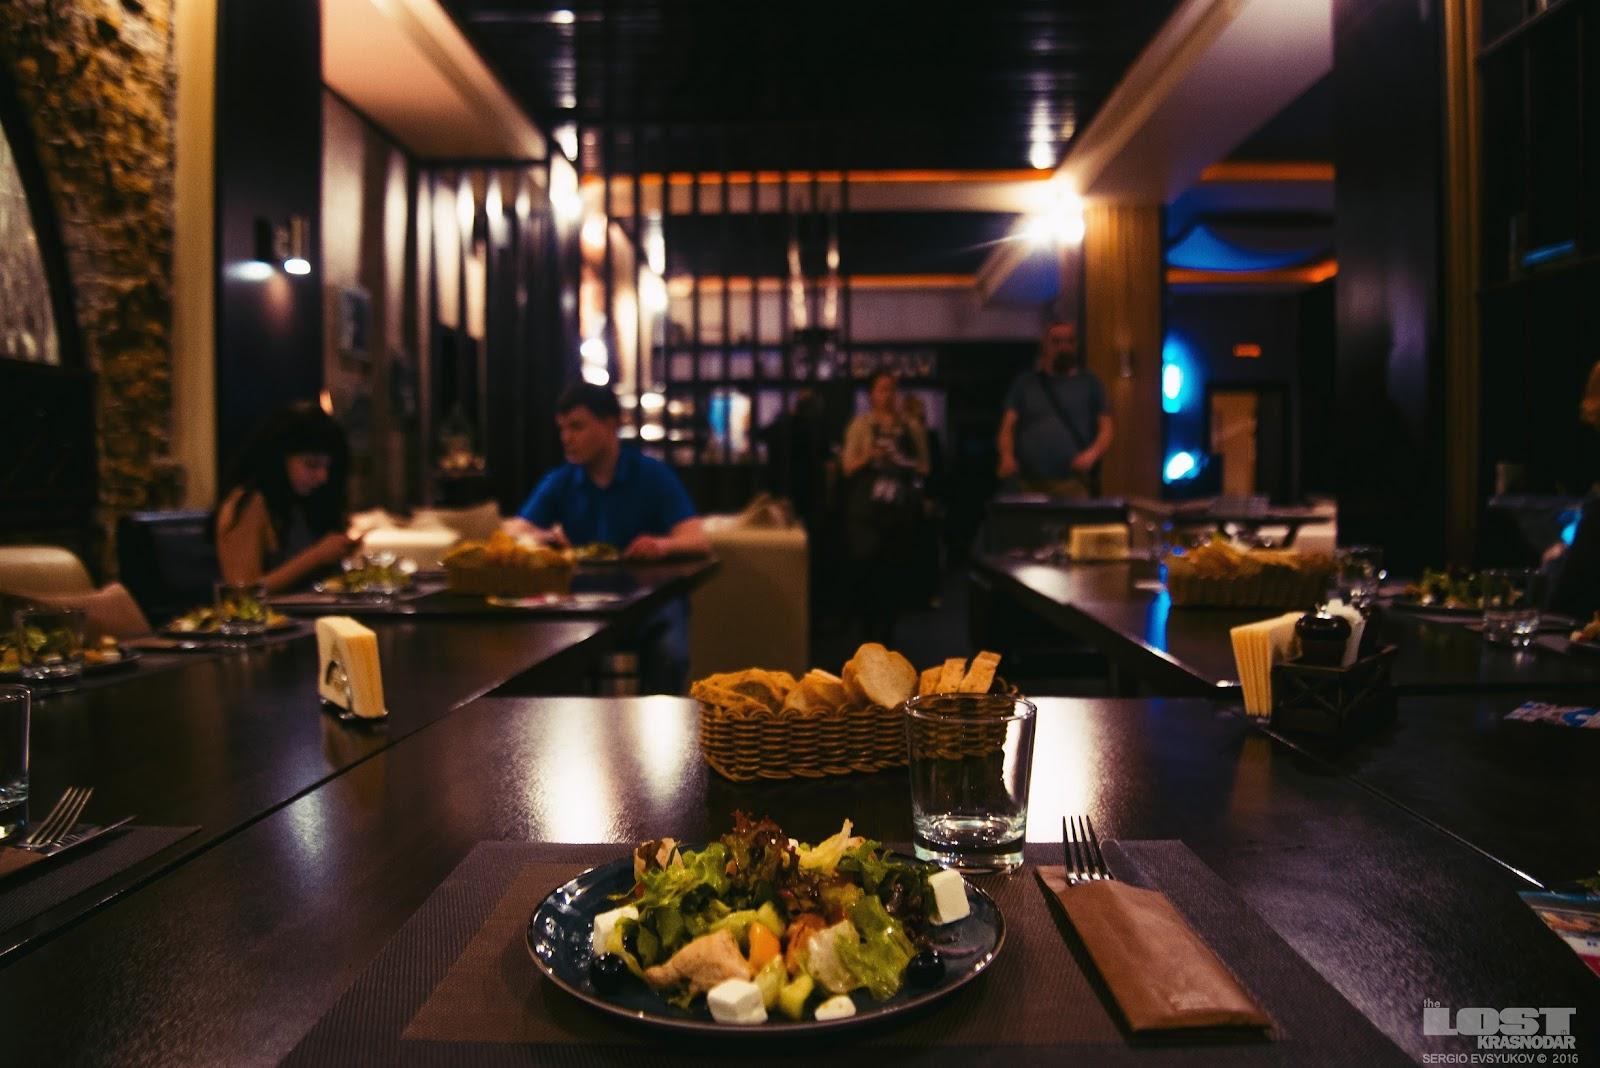 Ресторан Терраса ди Лаго в Абрау-Дюрсо